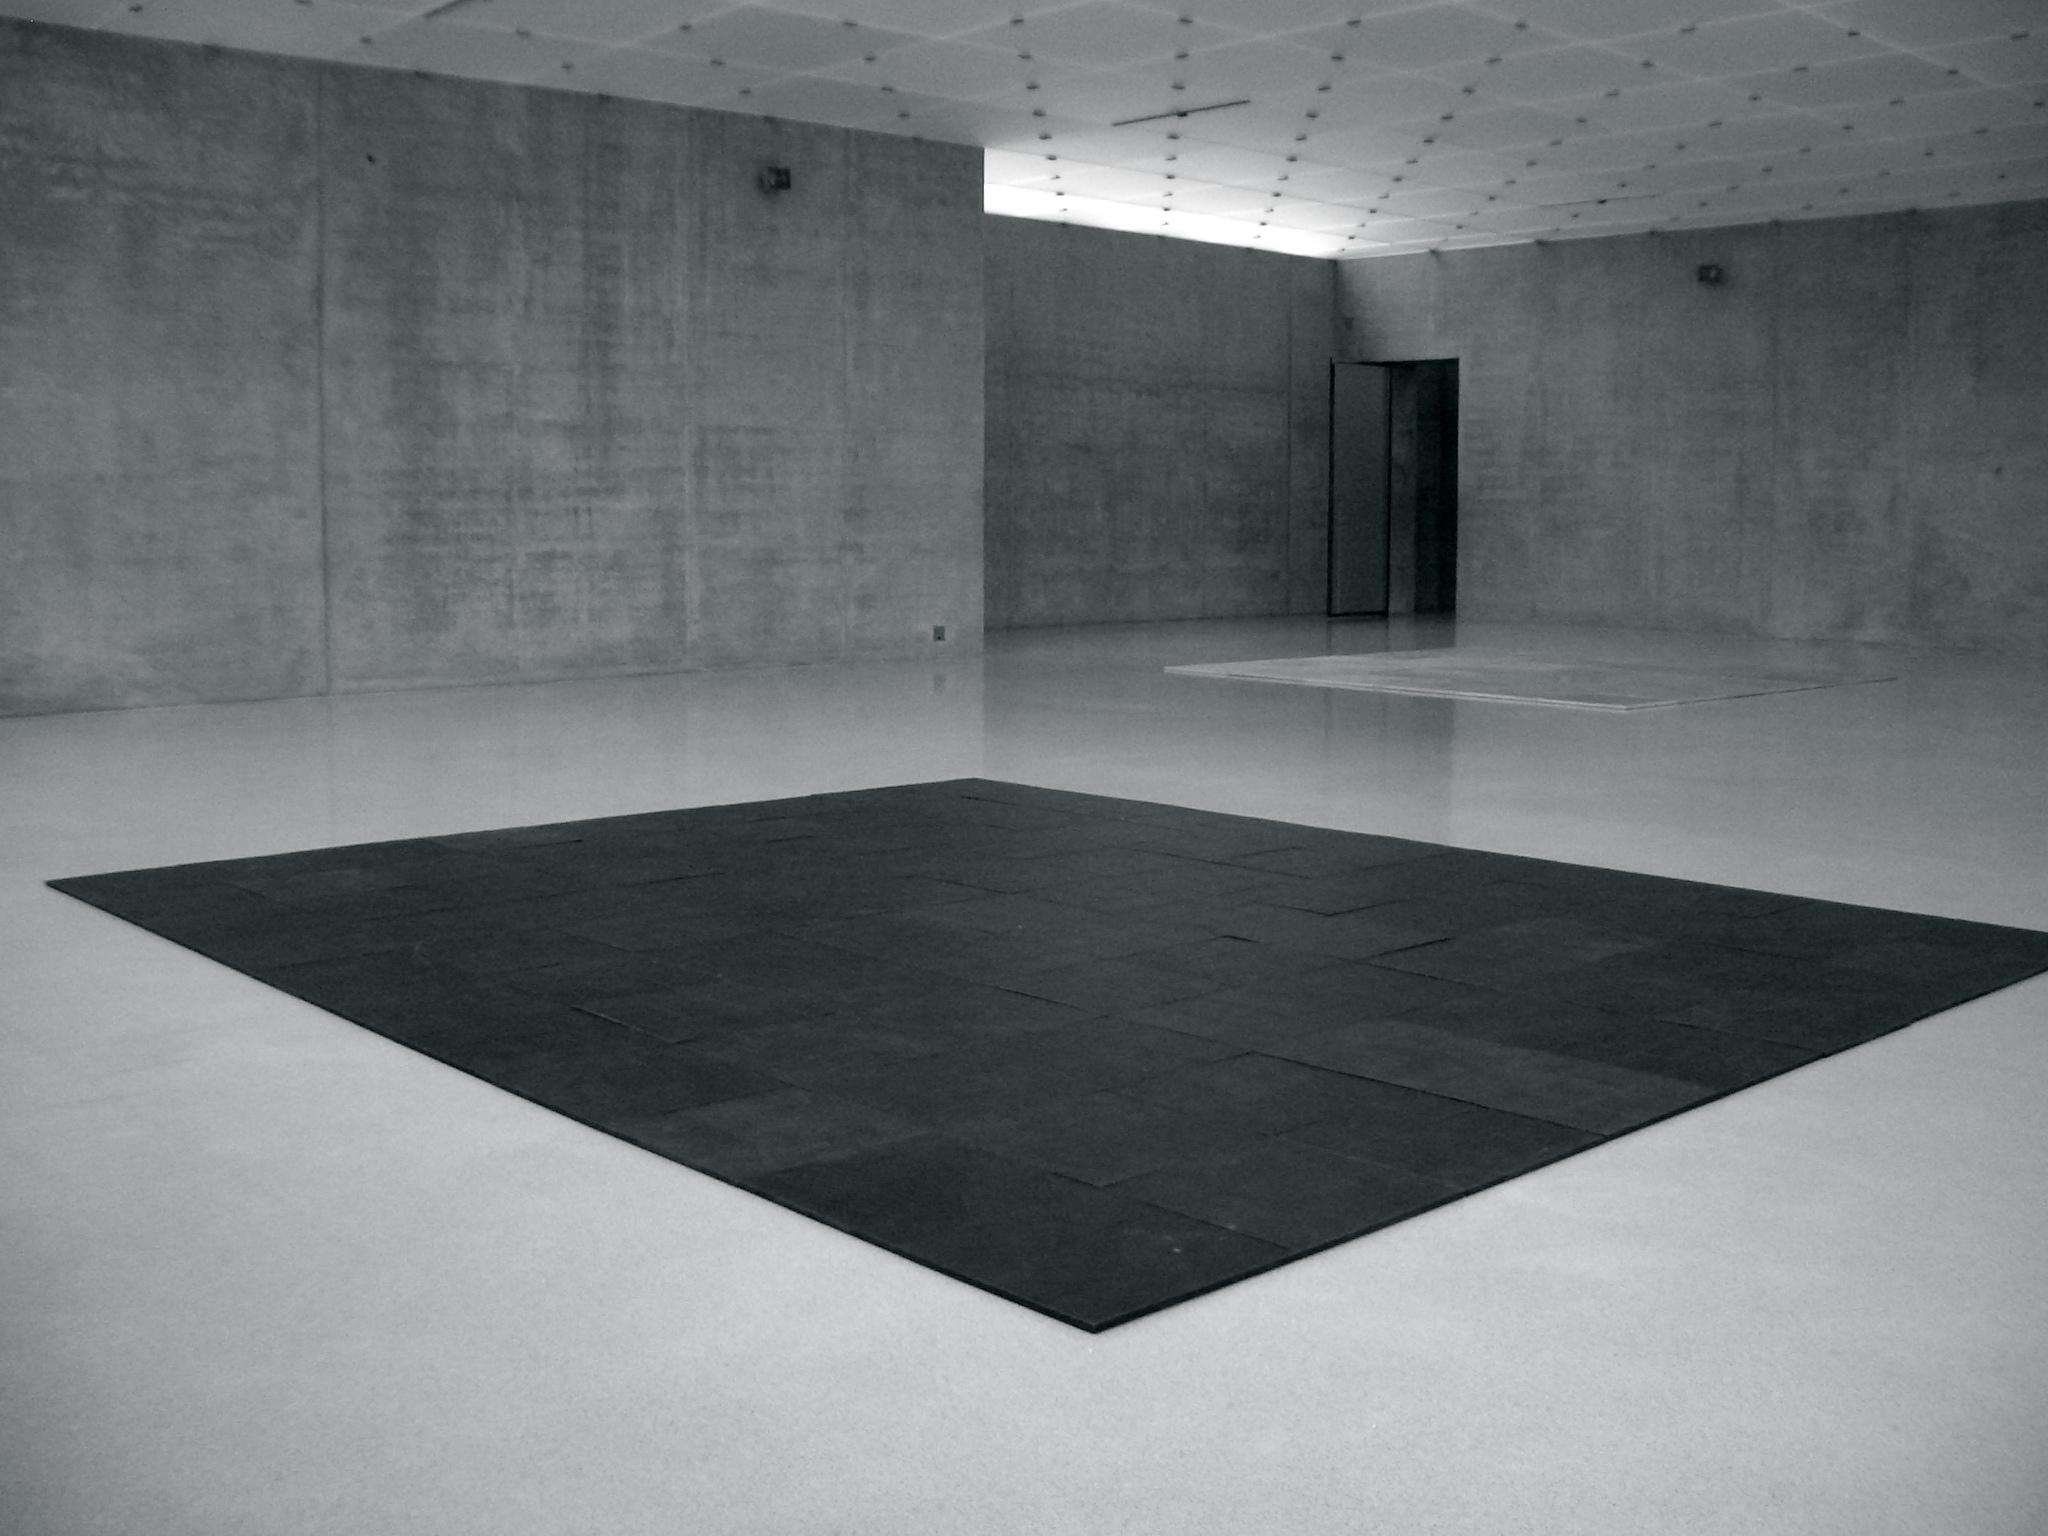 atm sferas blogarq. Black Bedroom Furniture Sets. Home Design Ideas